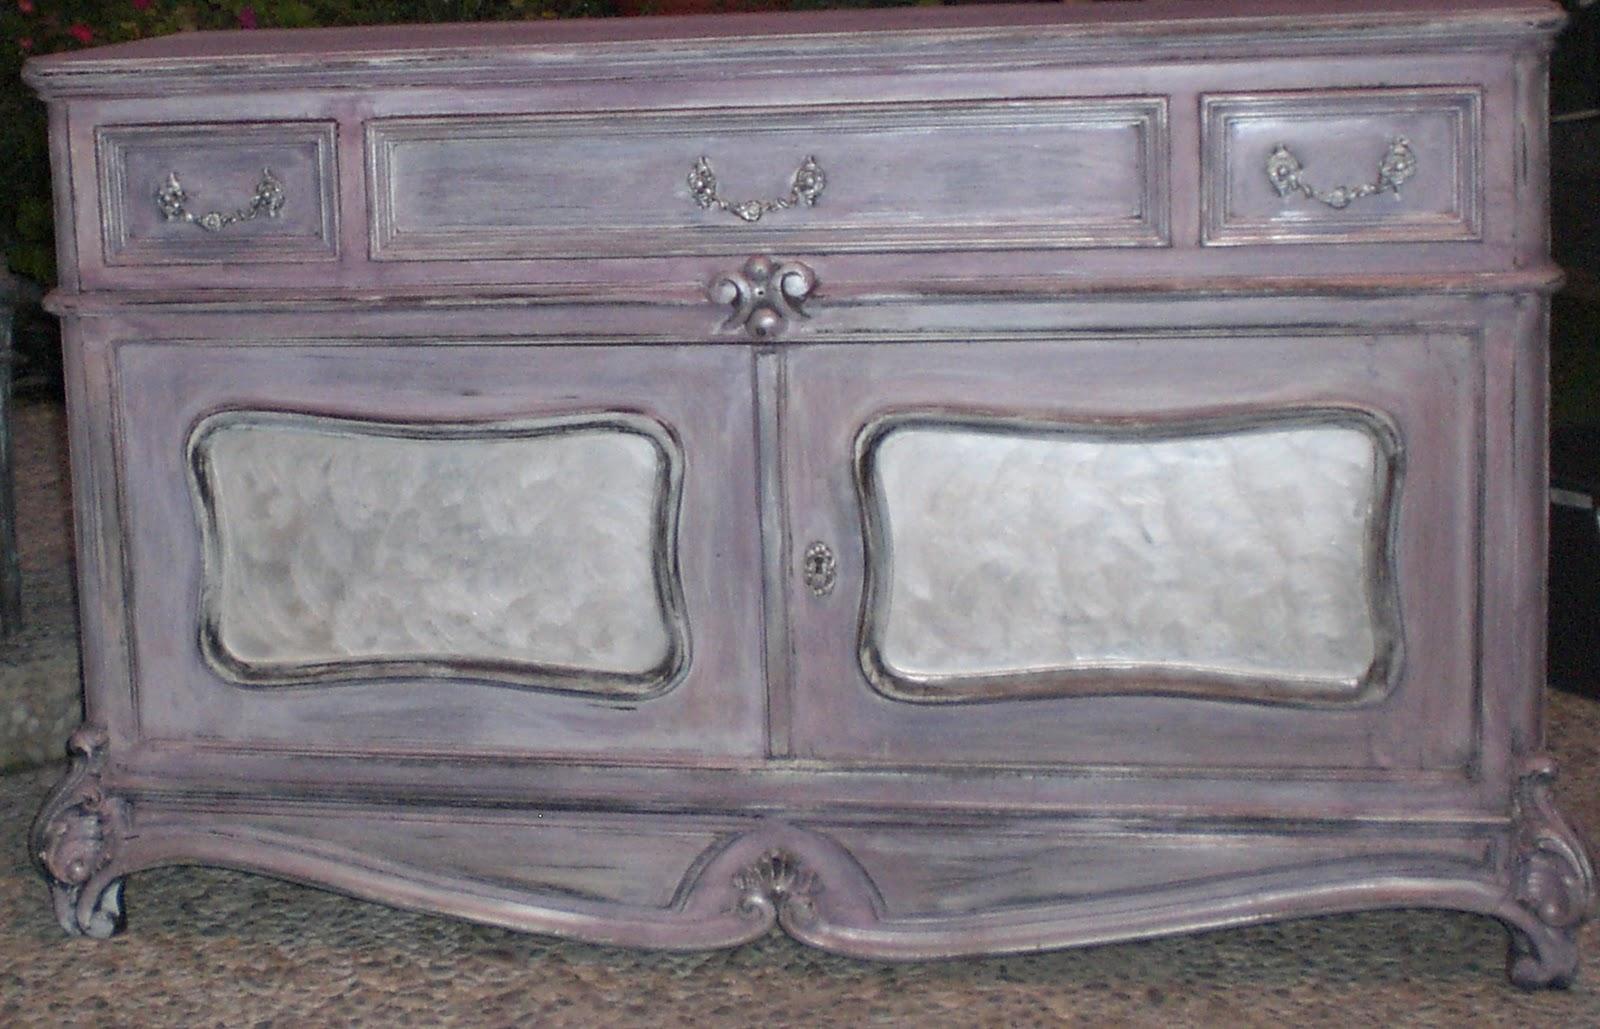 Pintar Un Mueble Viejo Dise Os Arquitect Nicos Mimasku Com # Muebles Efecto Lavado